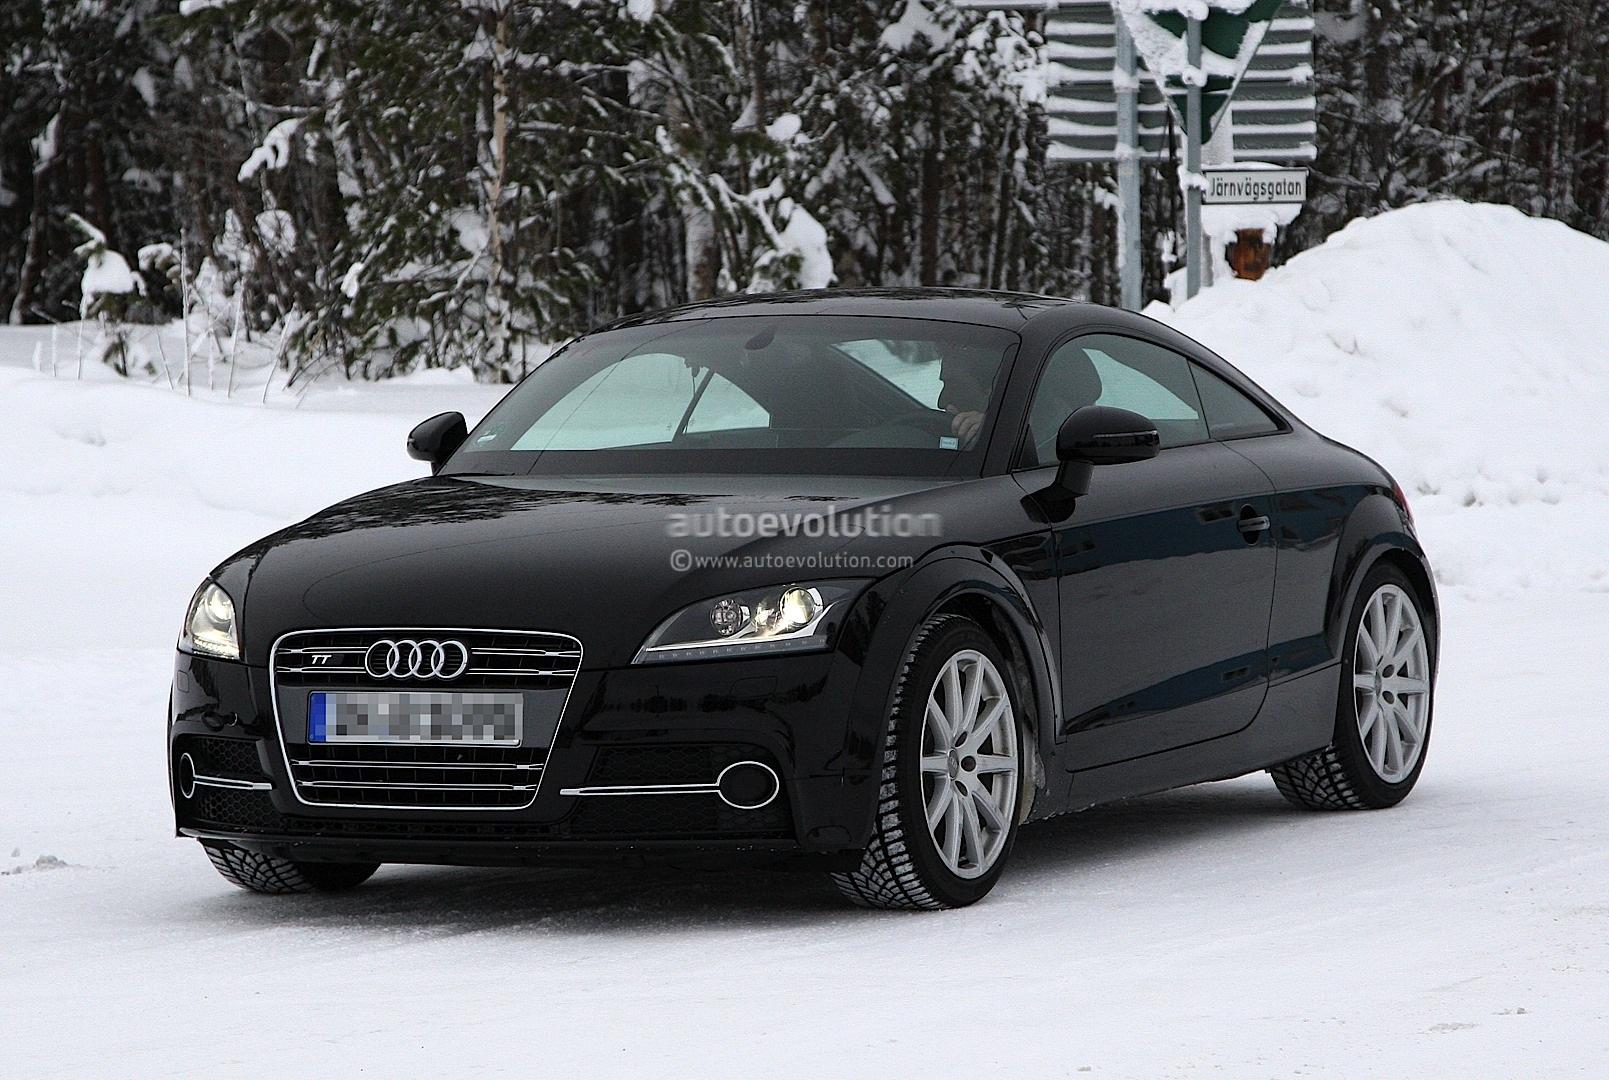 2014 Audi TT Test Mule Spyshots - photo gallery